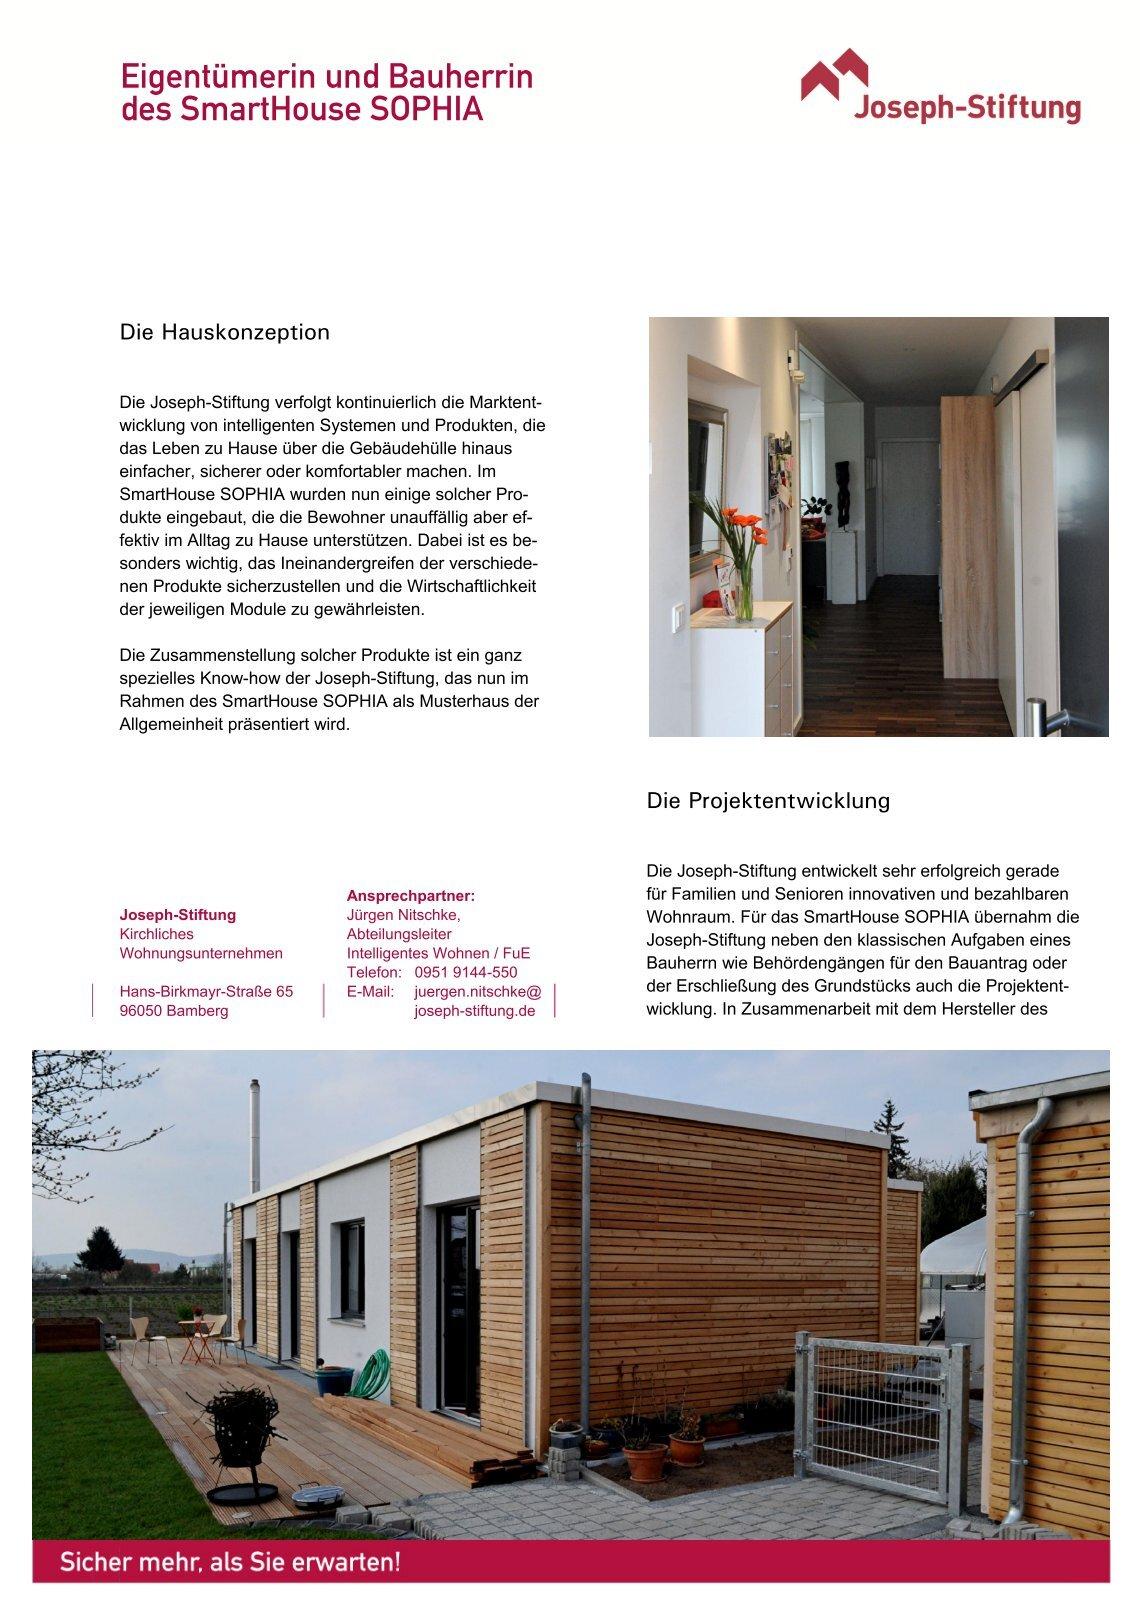 Großzügig Rahmen Gerade Systeme Fotos - Familienfoto Kunst Ideen ...